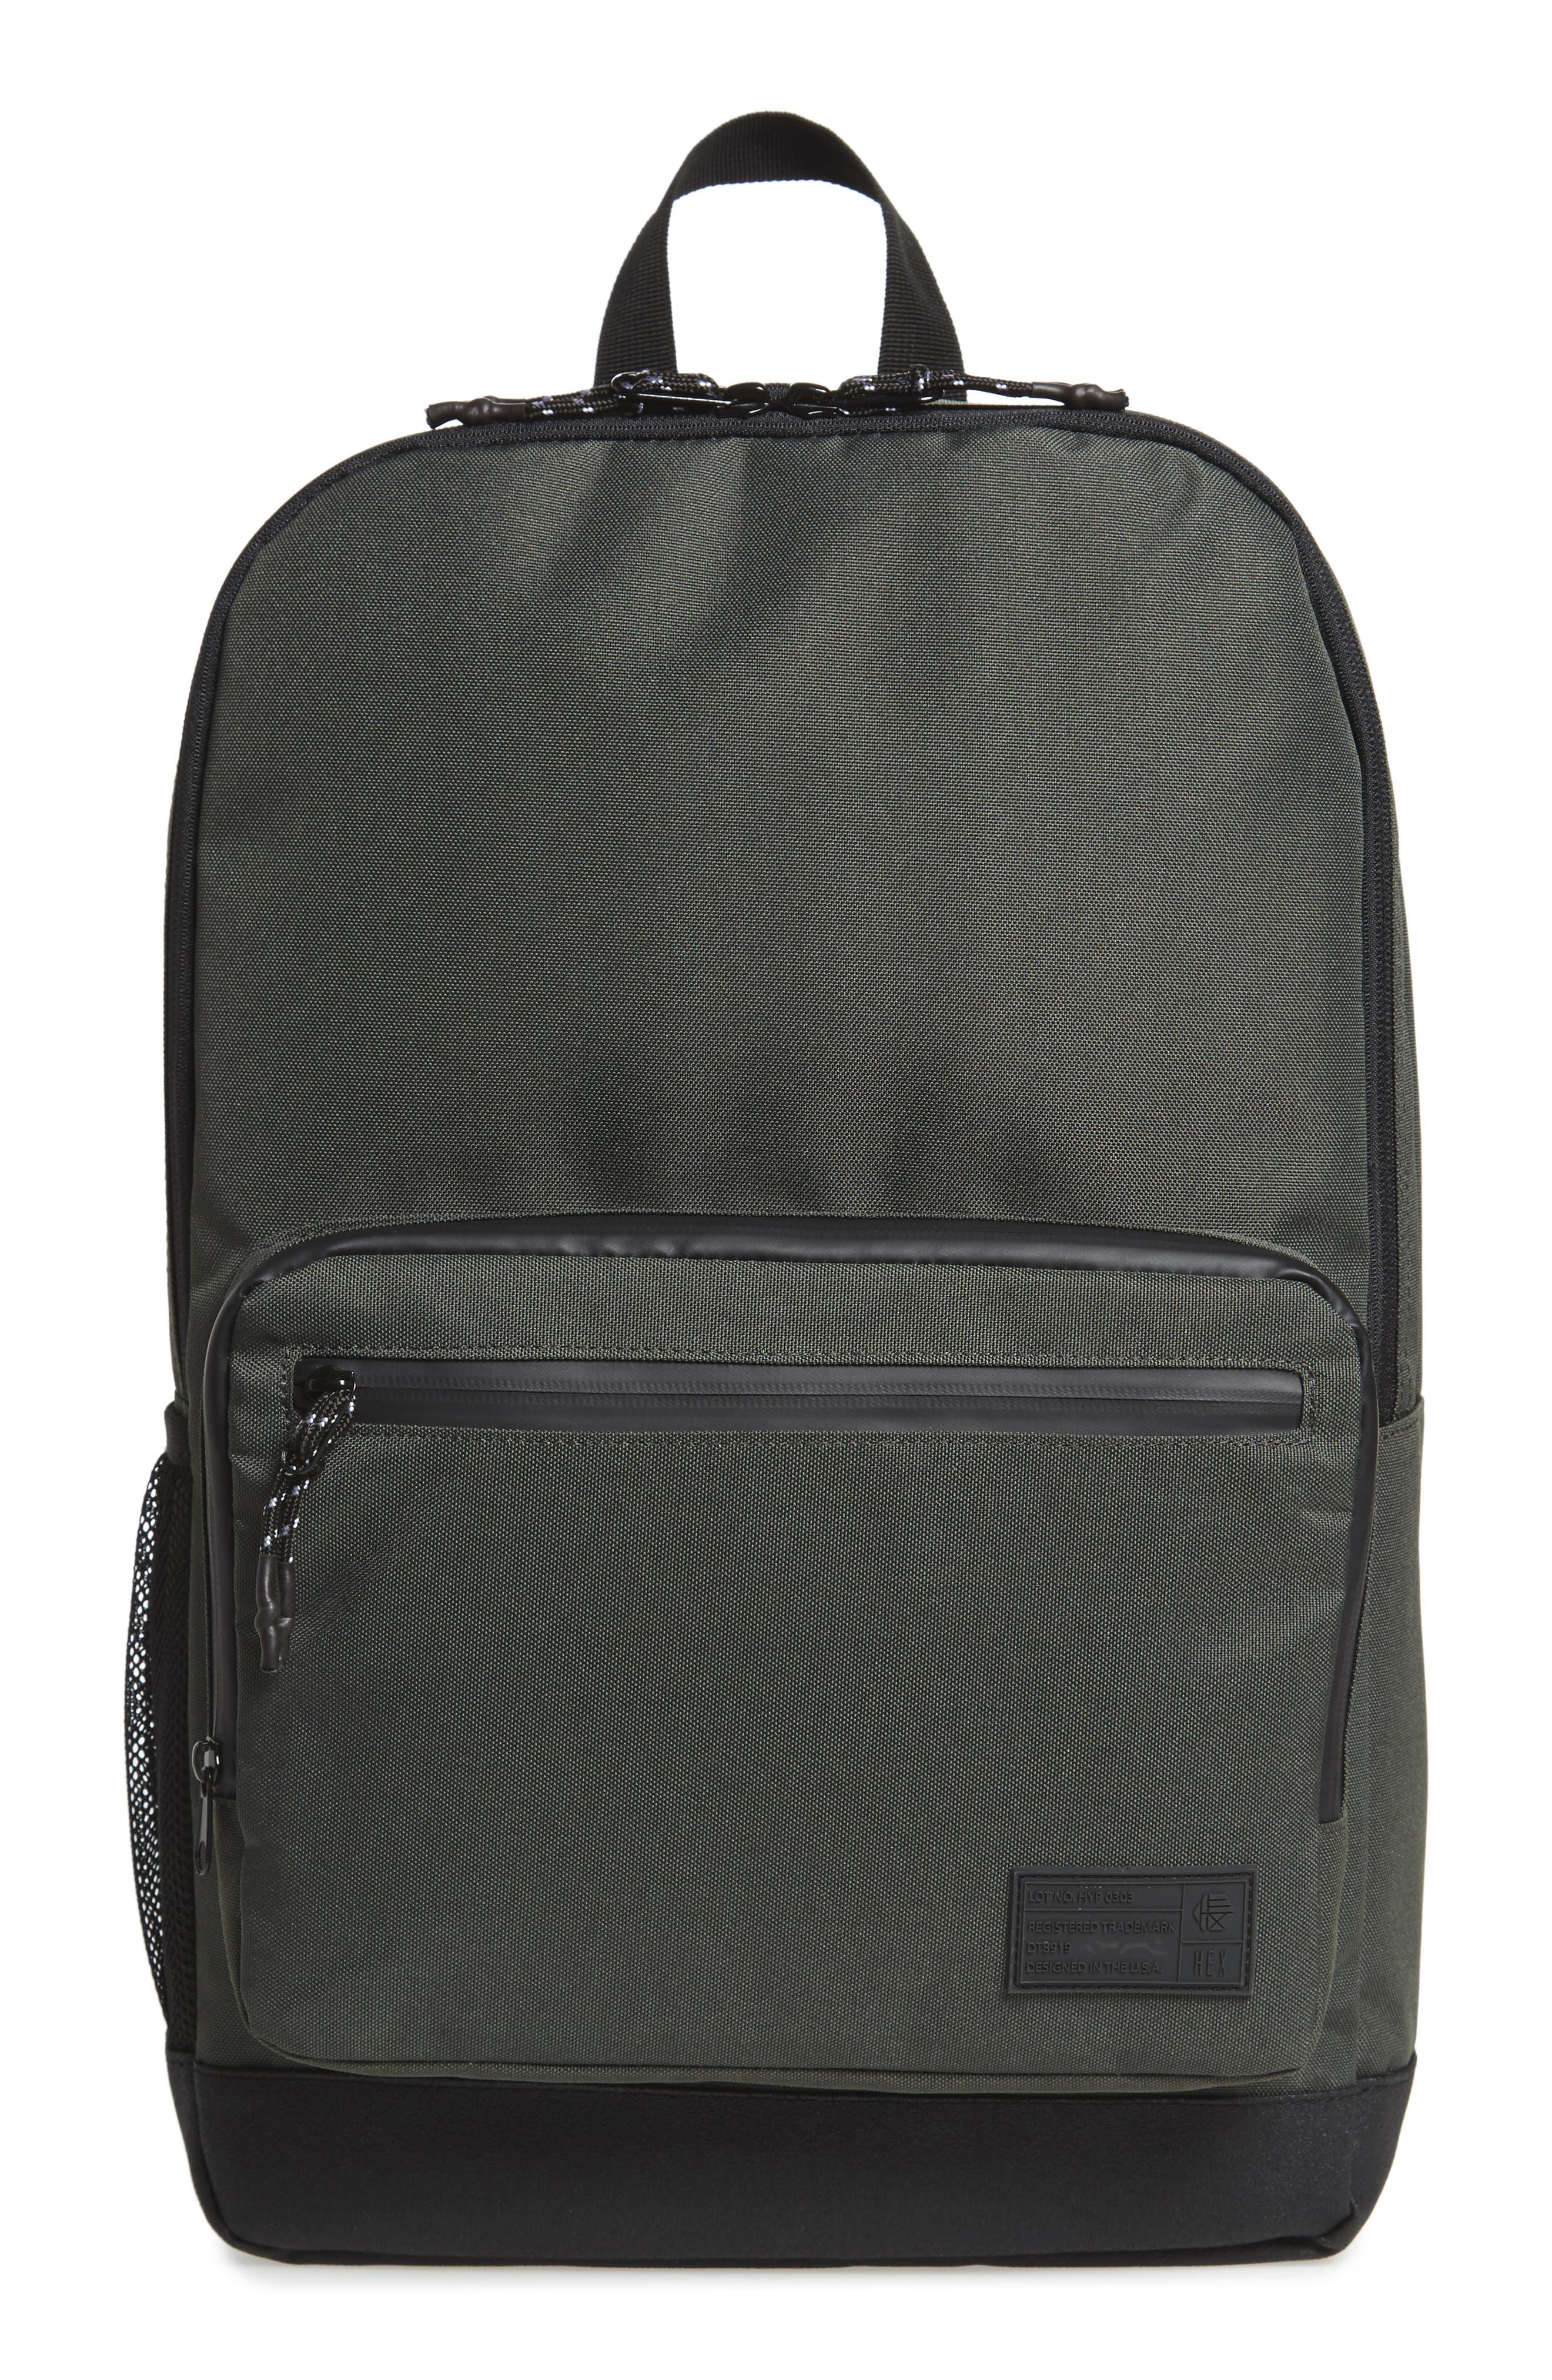 Alternate Image 1 Selected - HEX Surf Backpack